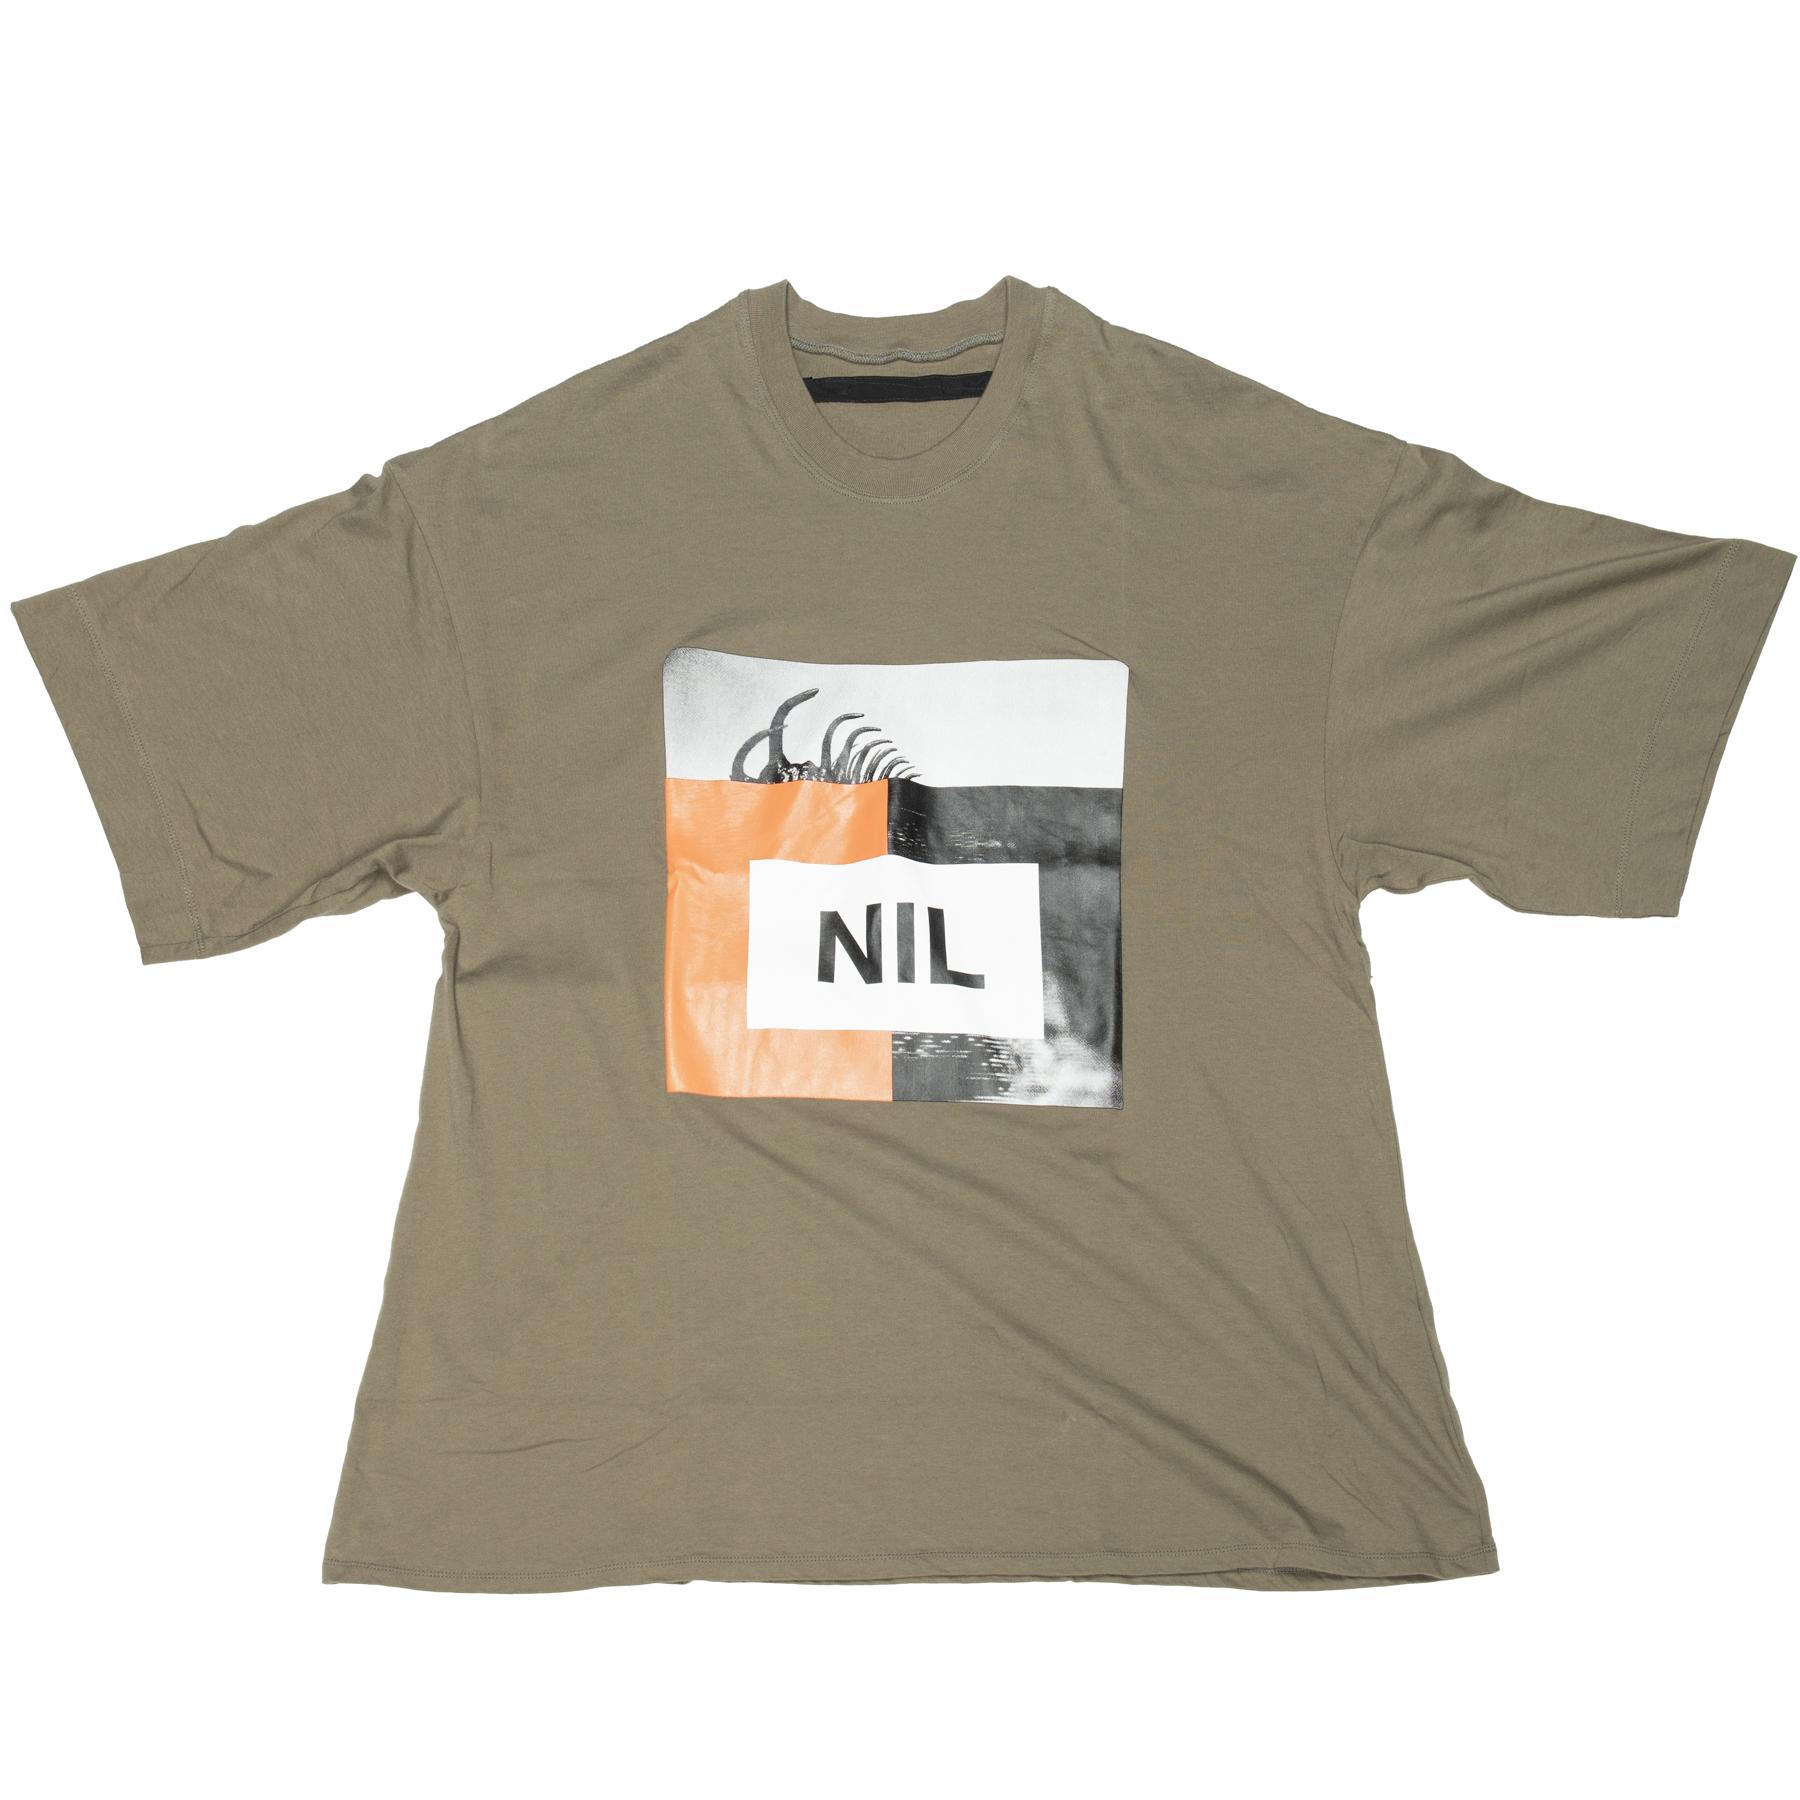 640CPM12-OLIVE / NIL ミックスT-シャツ